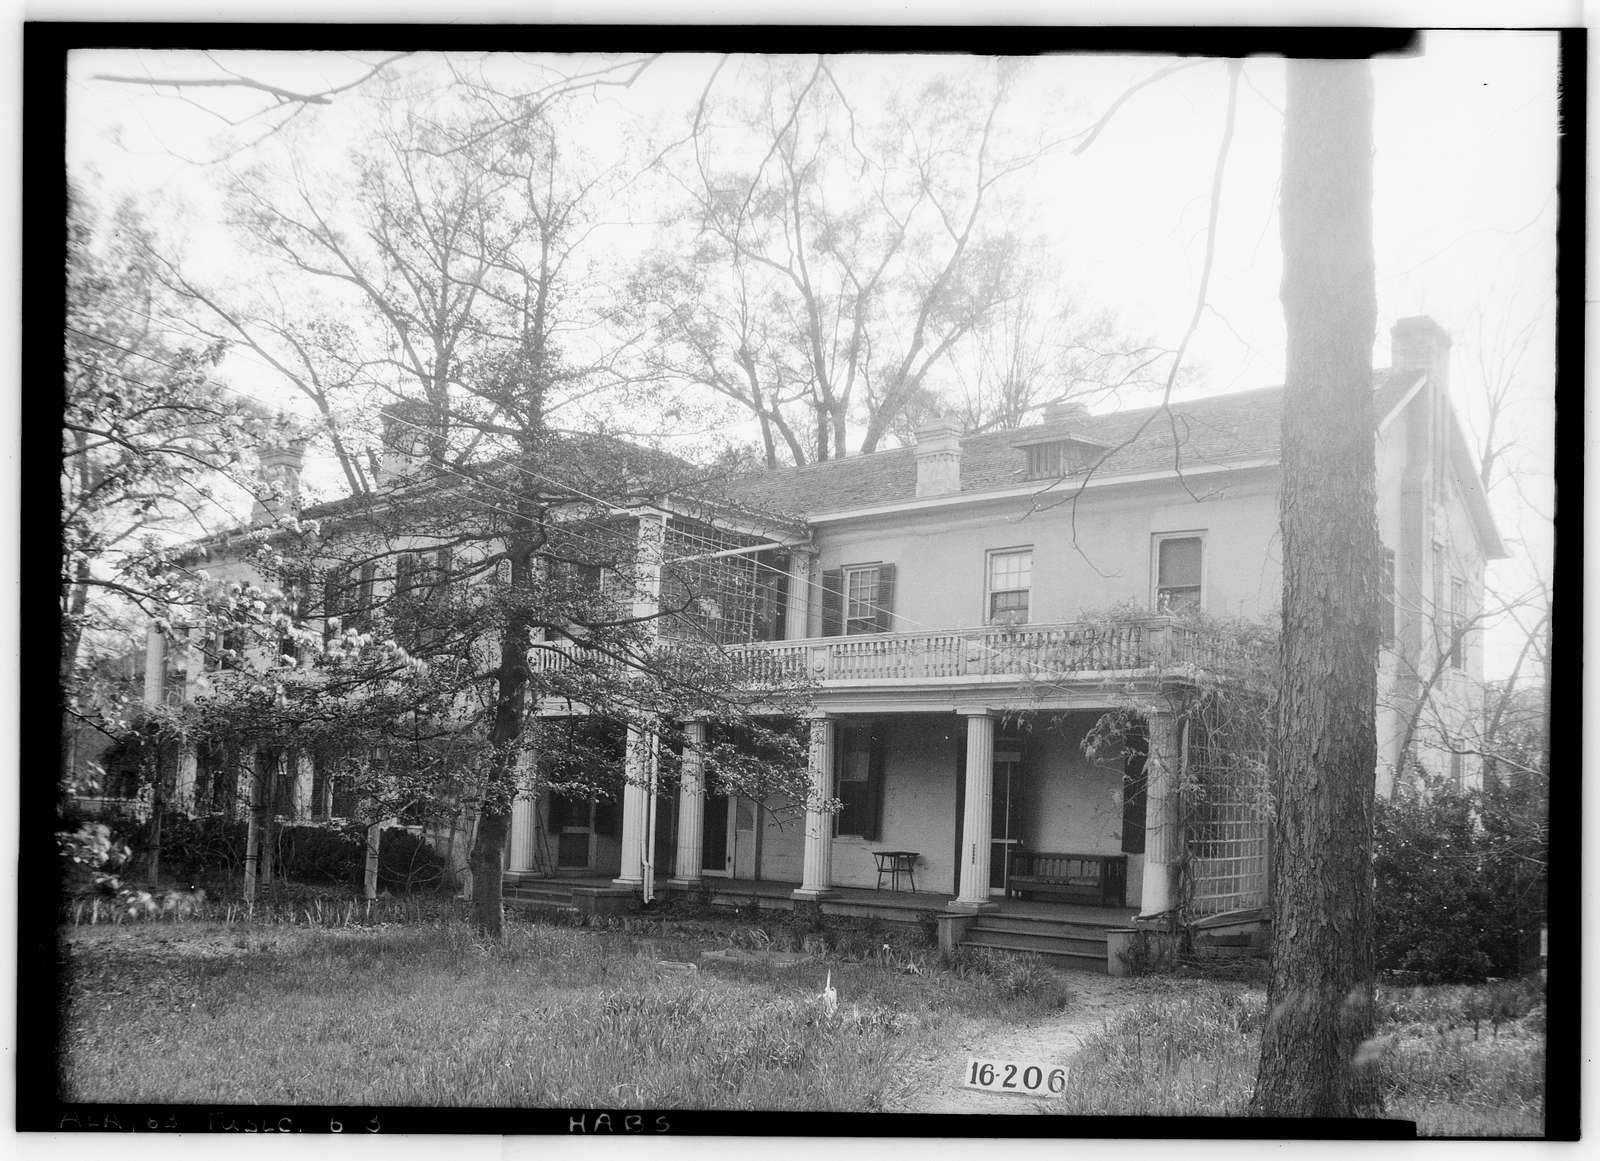 E. N. C. Snow House, 2414 Eighth Street, Tuscaloosa, Tuscaloosa County, AL